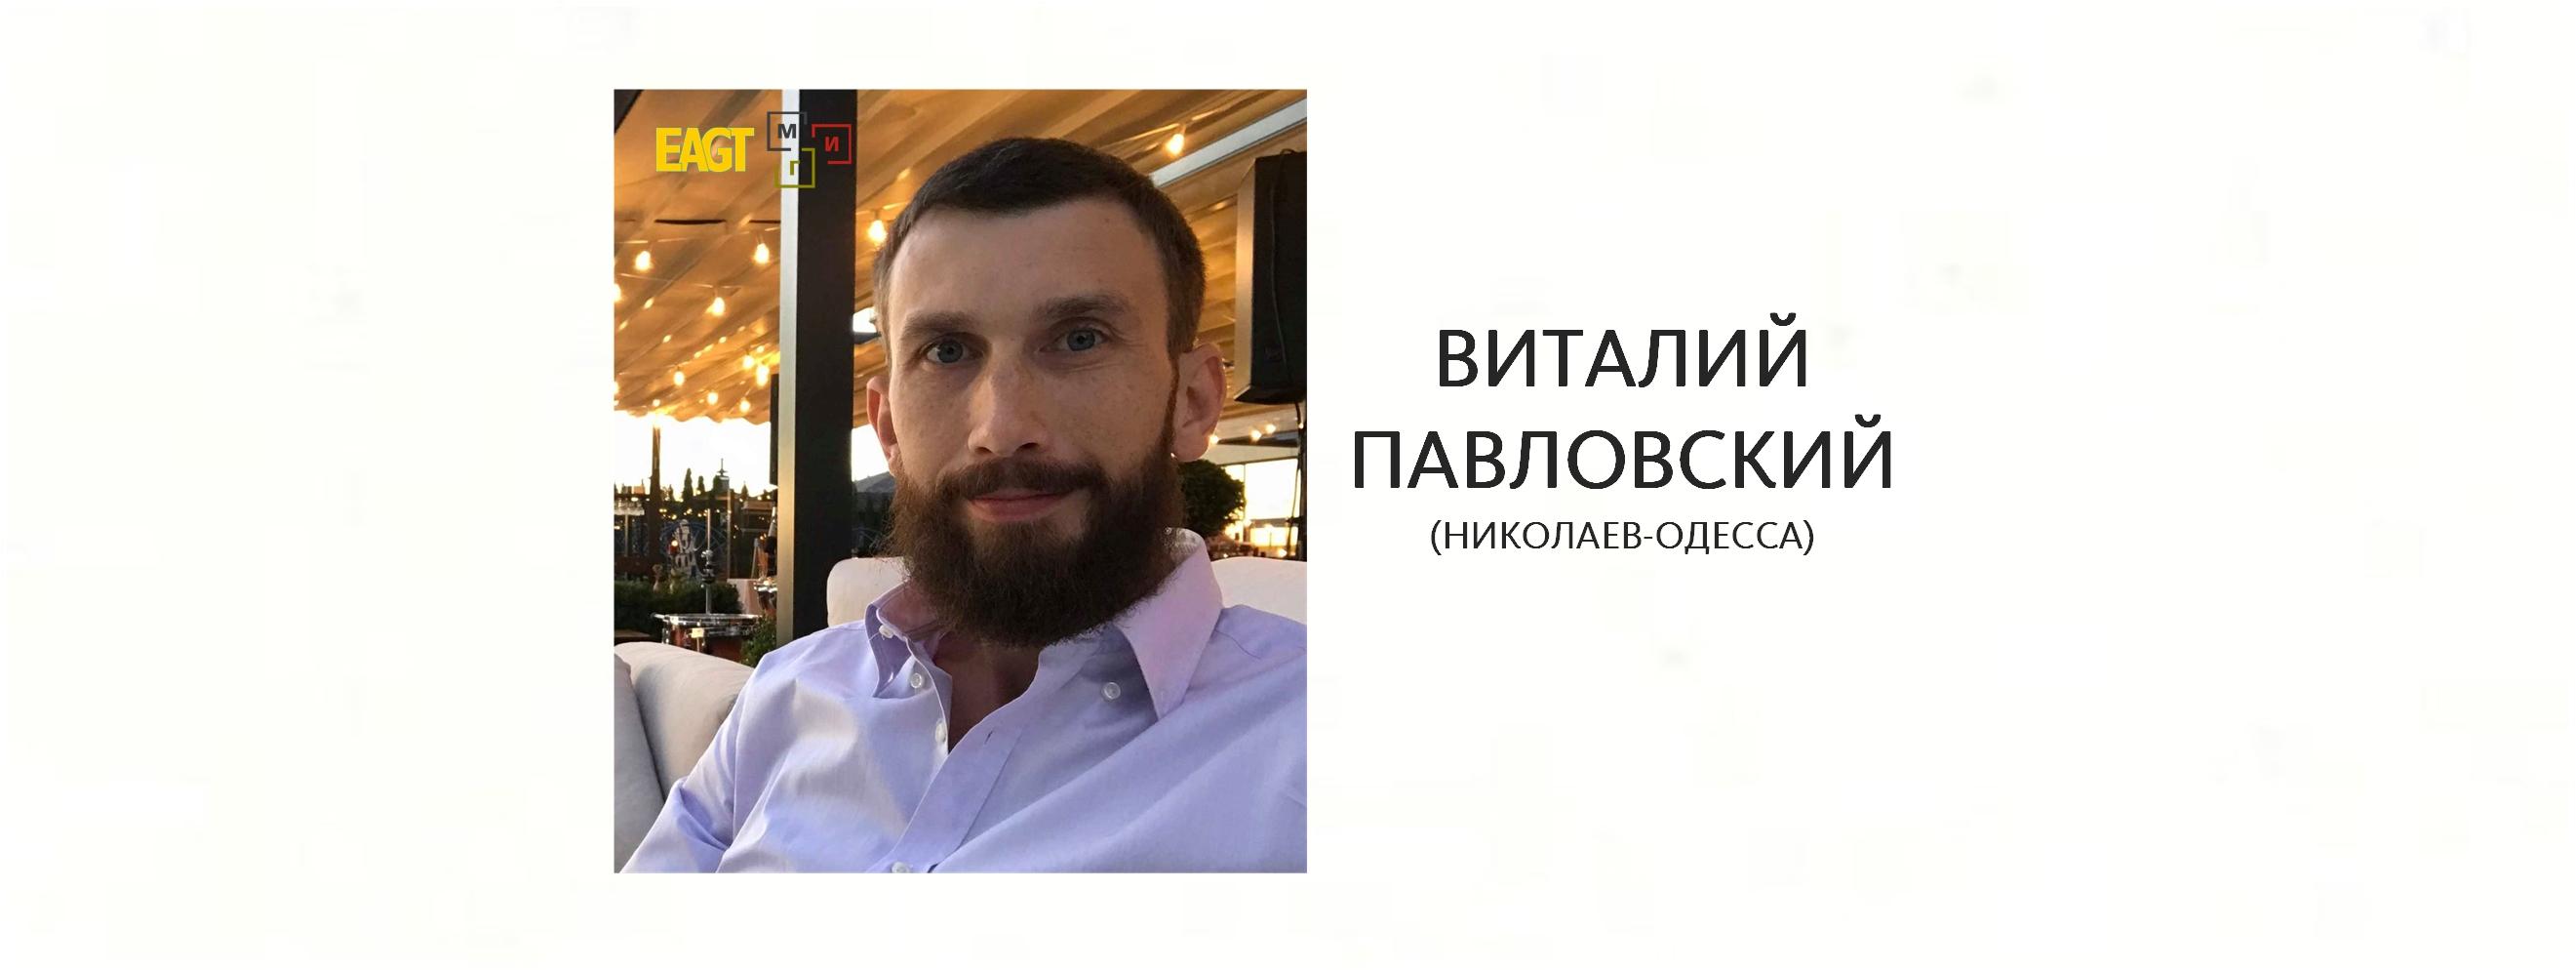 Виталий Павловский